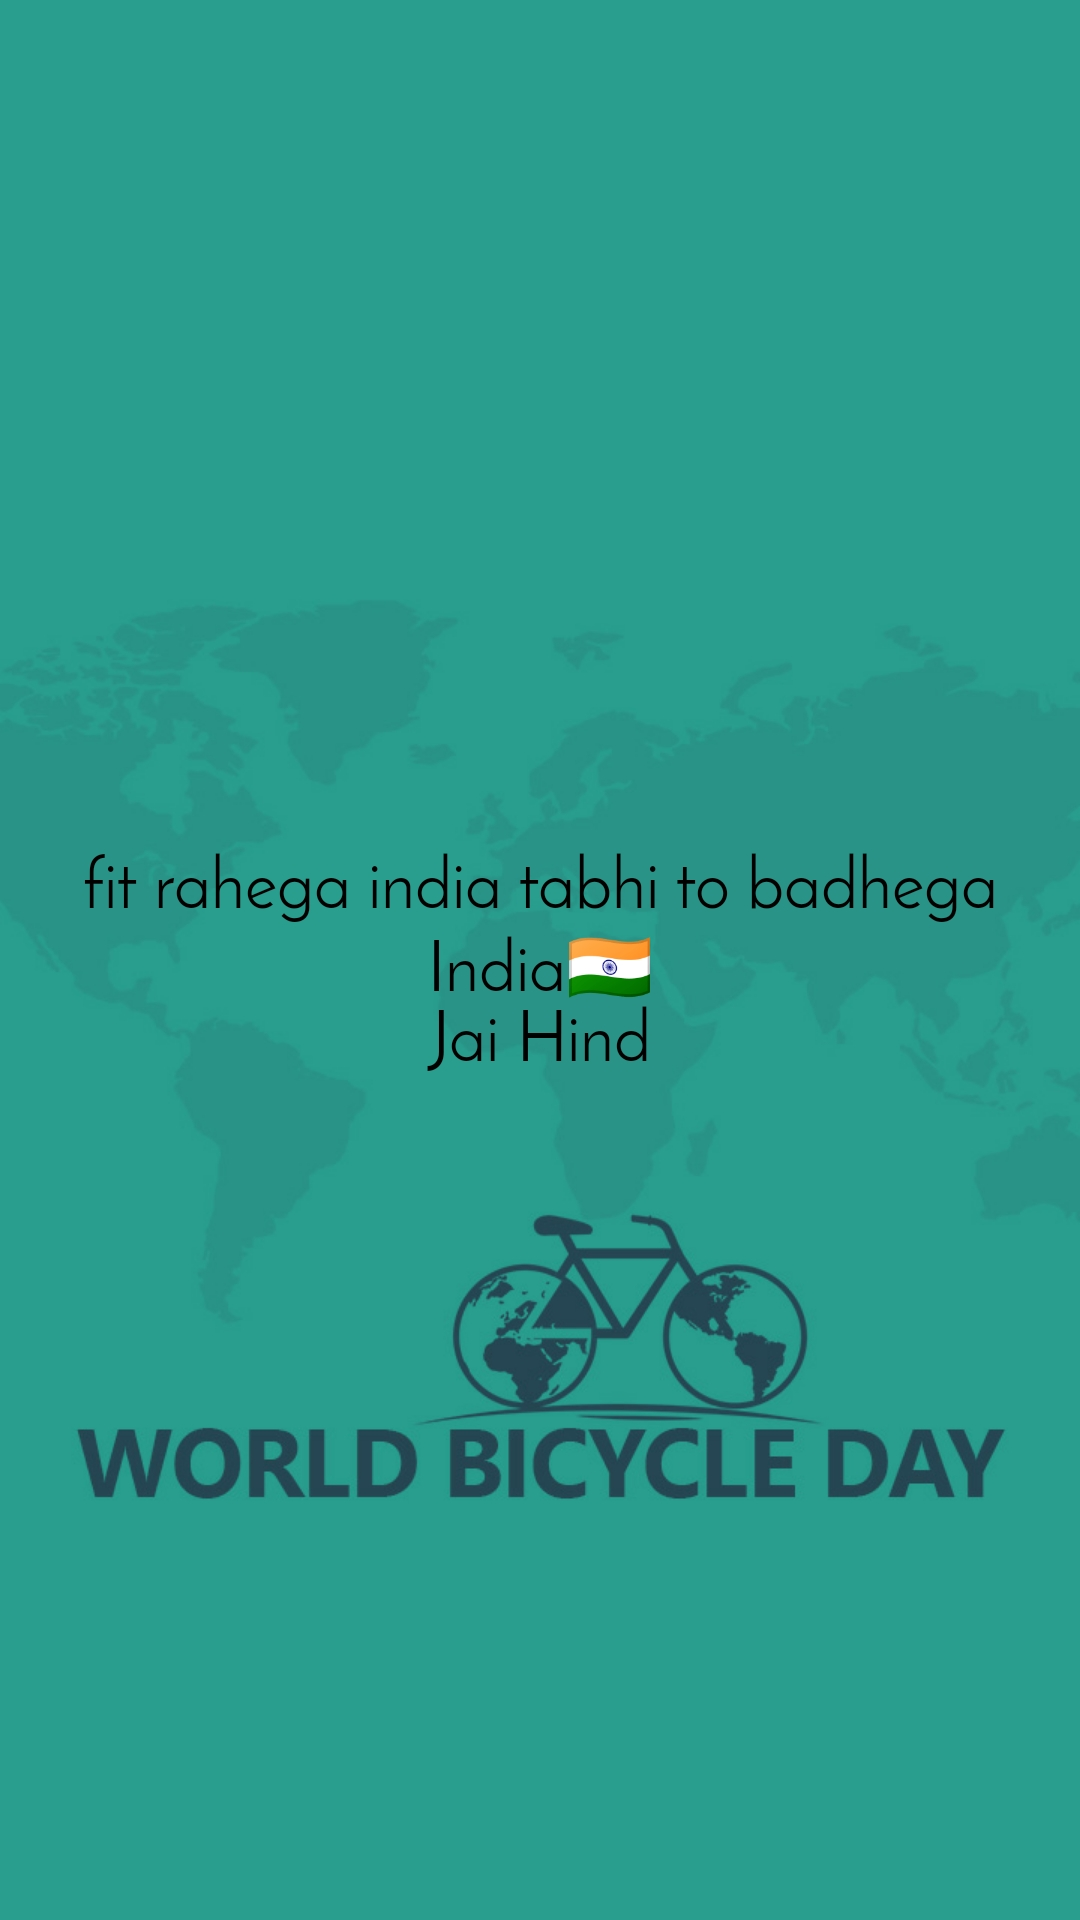 fit rahega india tabhi to badhega India🇮🇳 Jai Hind